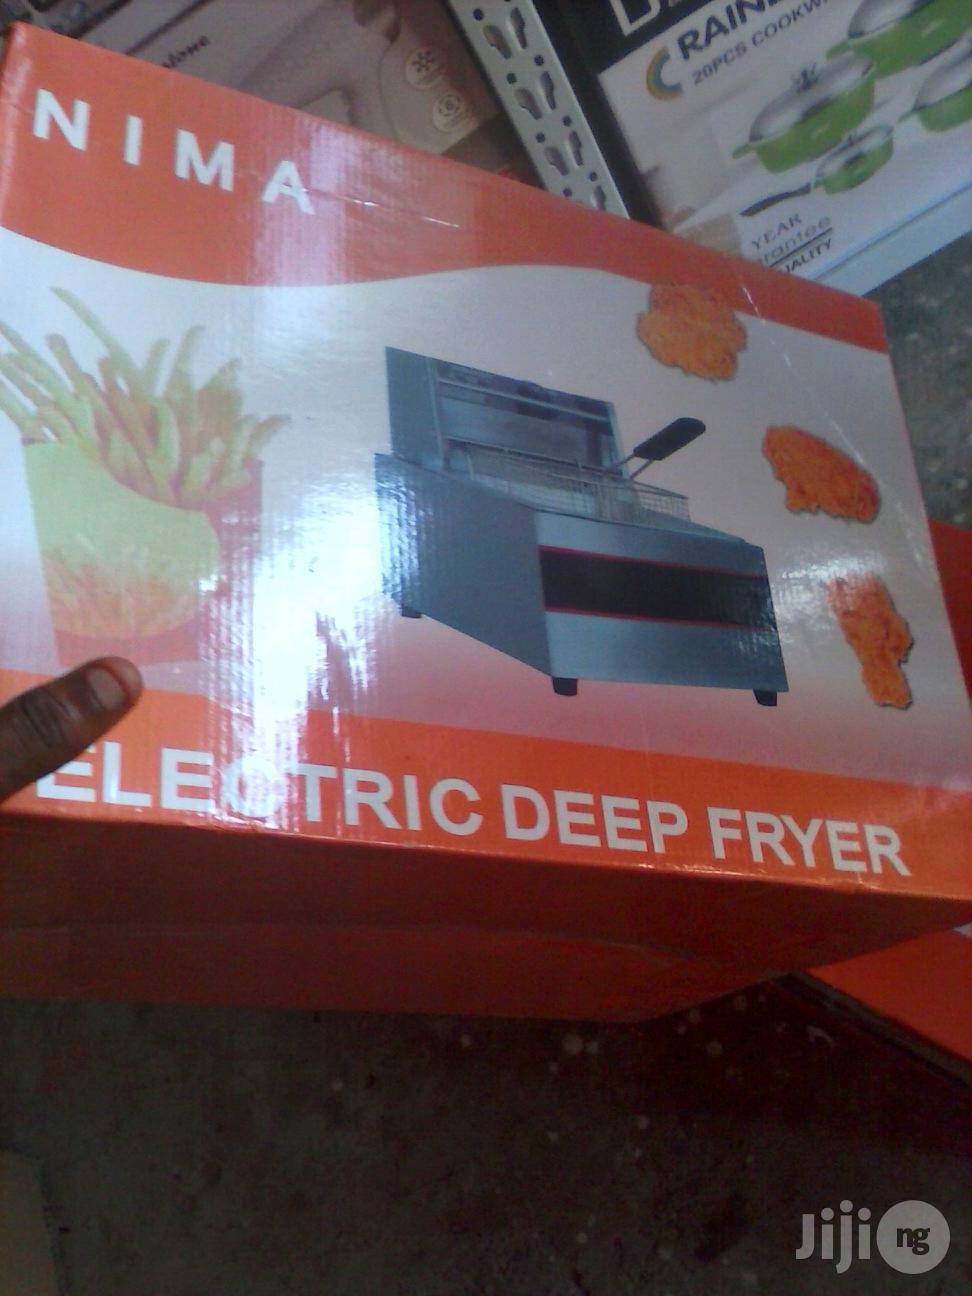 Archive: Electric Deep Fryer